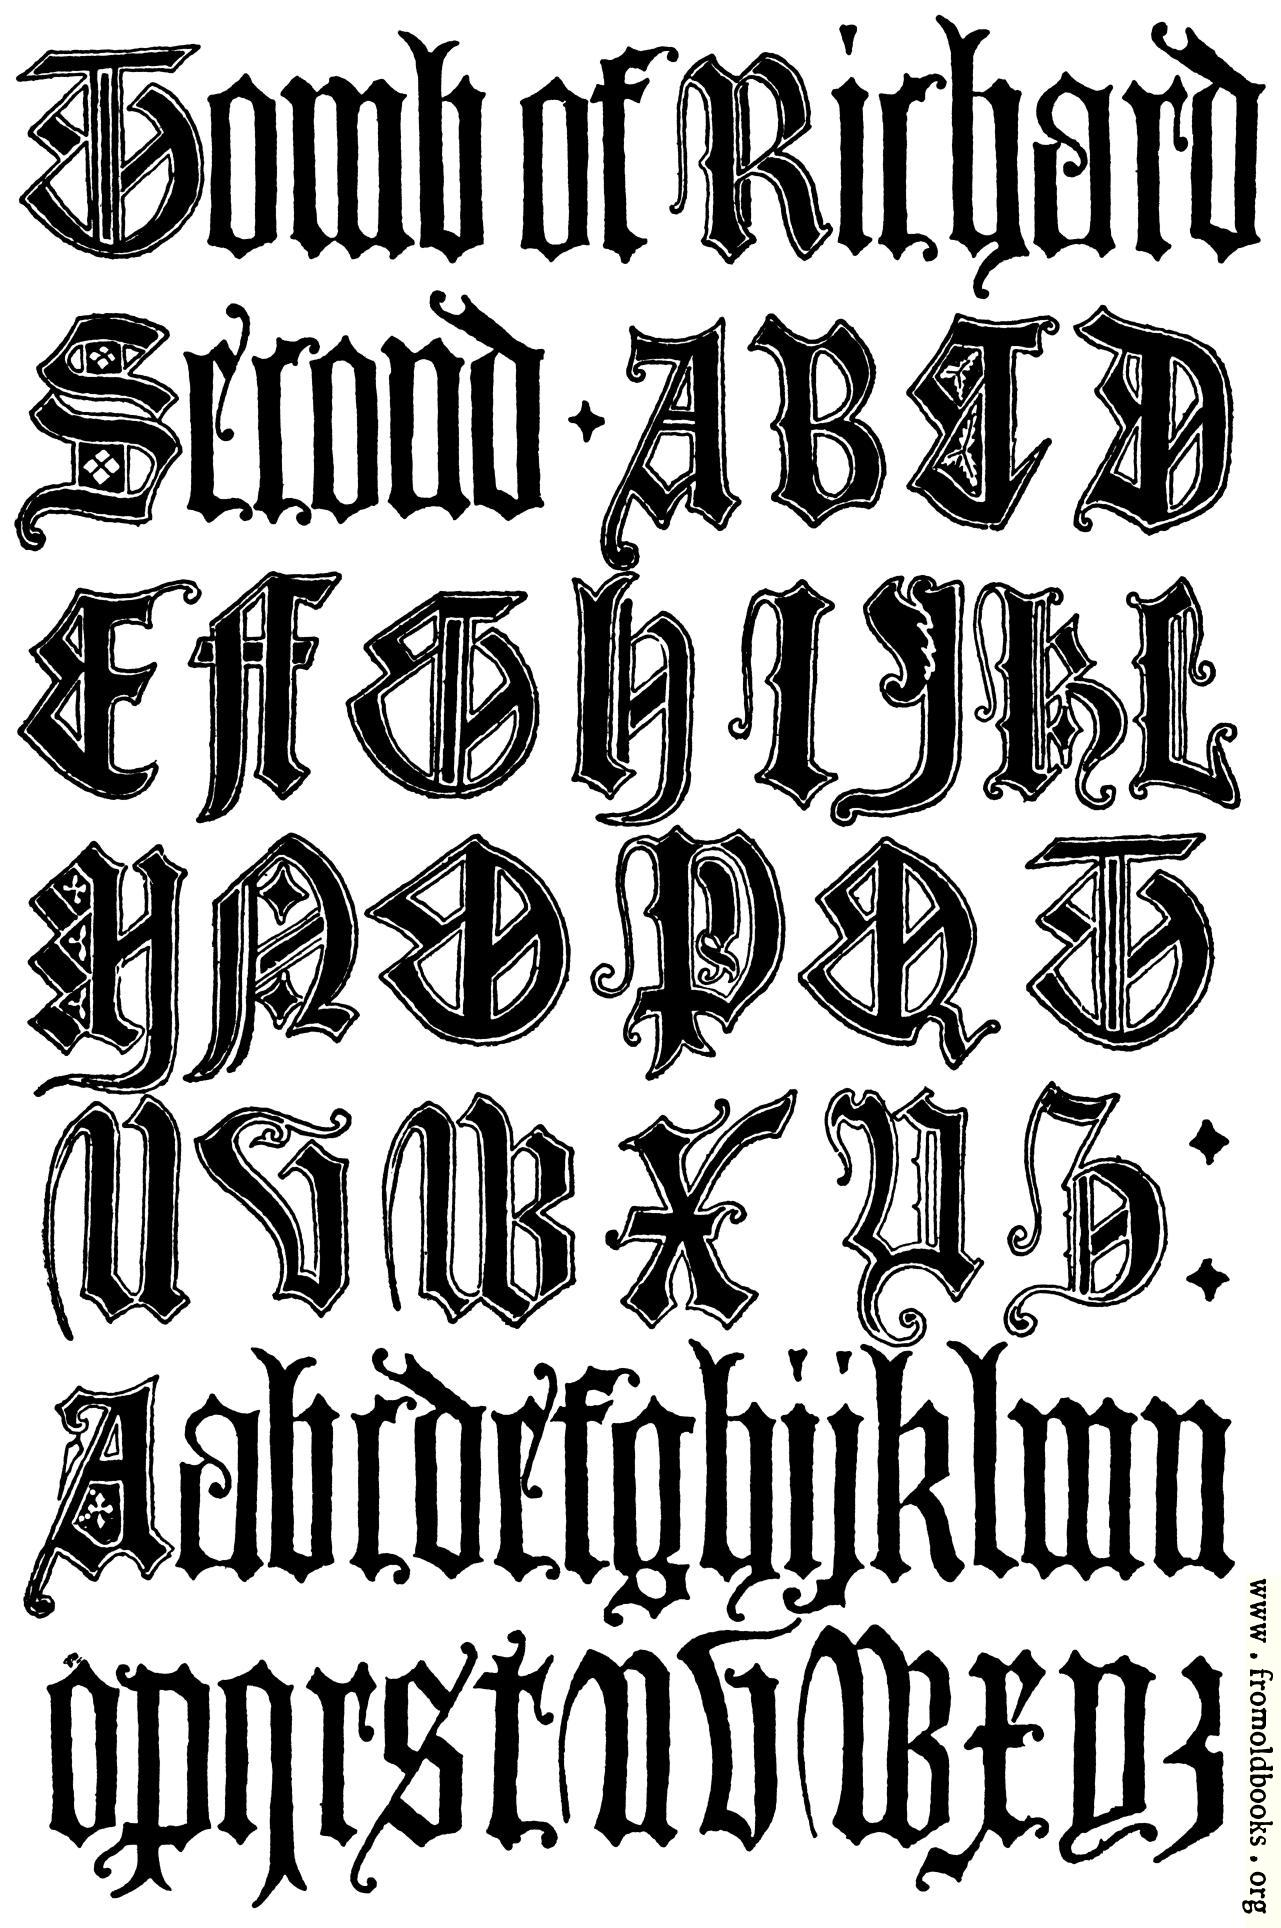 179 English Gothic Letters 15th Century F C B Image